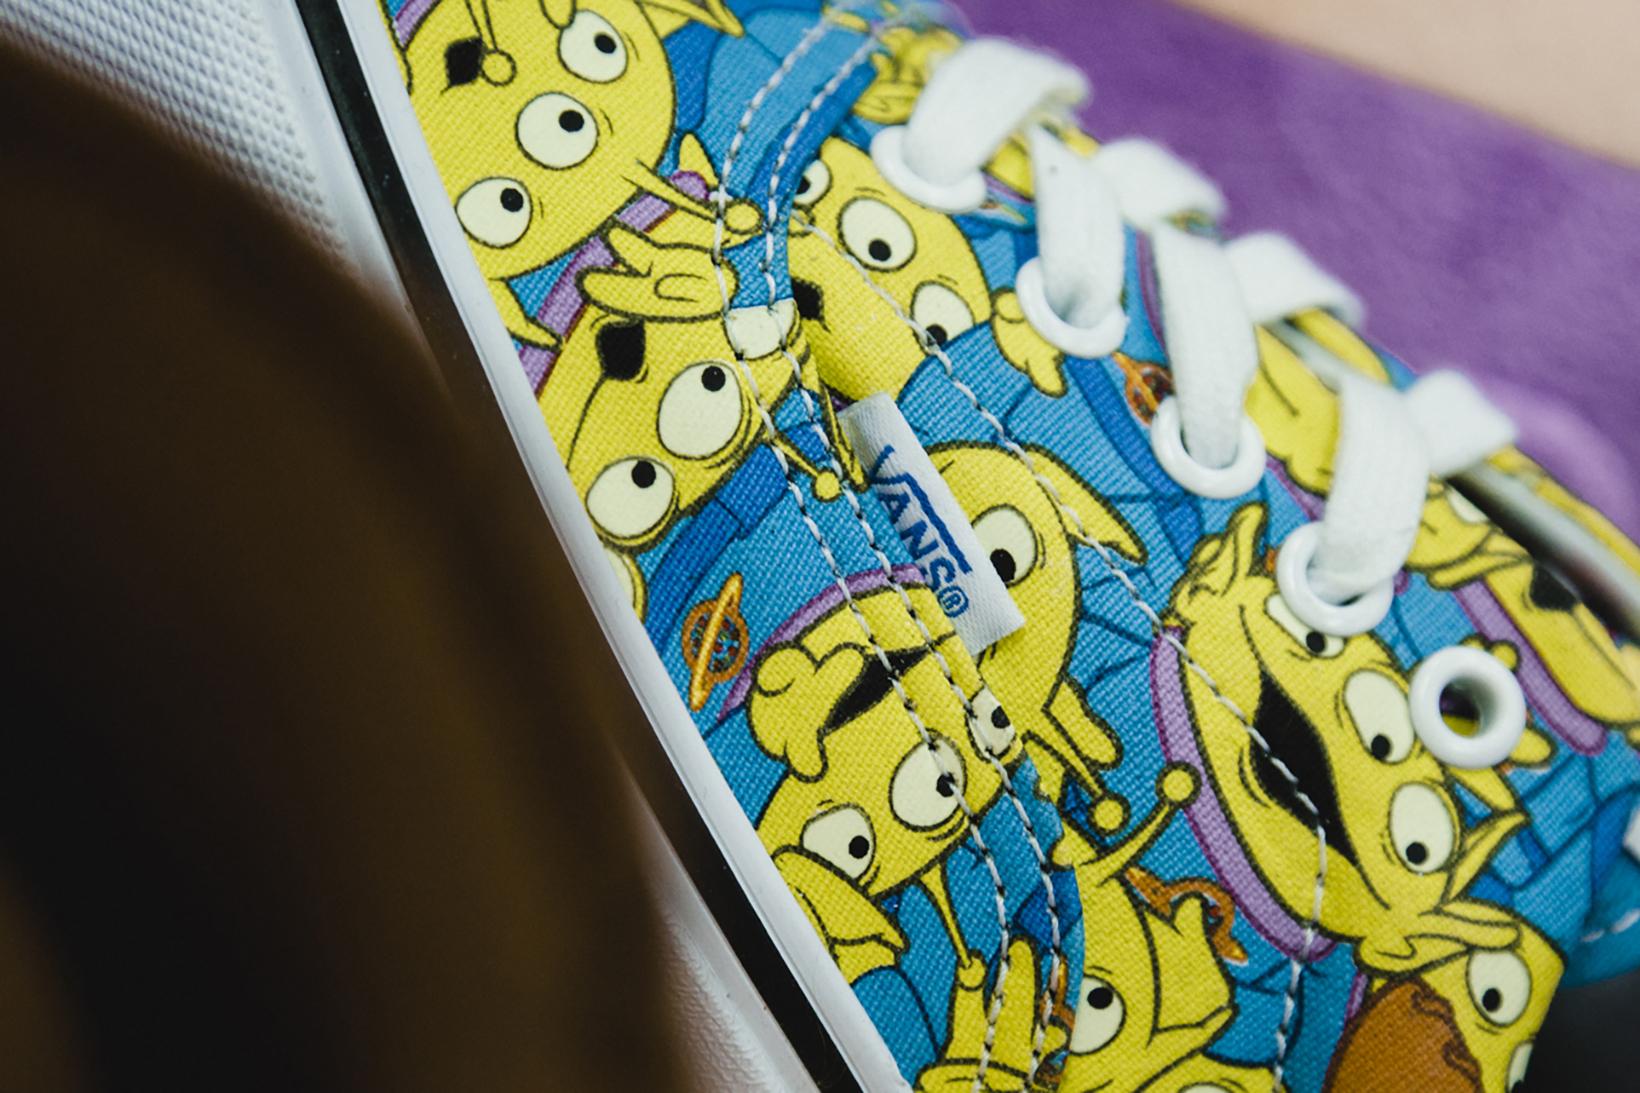 Toy Story Vans Sneakers Woody Buzz Lightyear Disney - 1765026